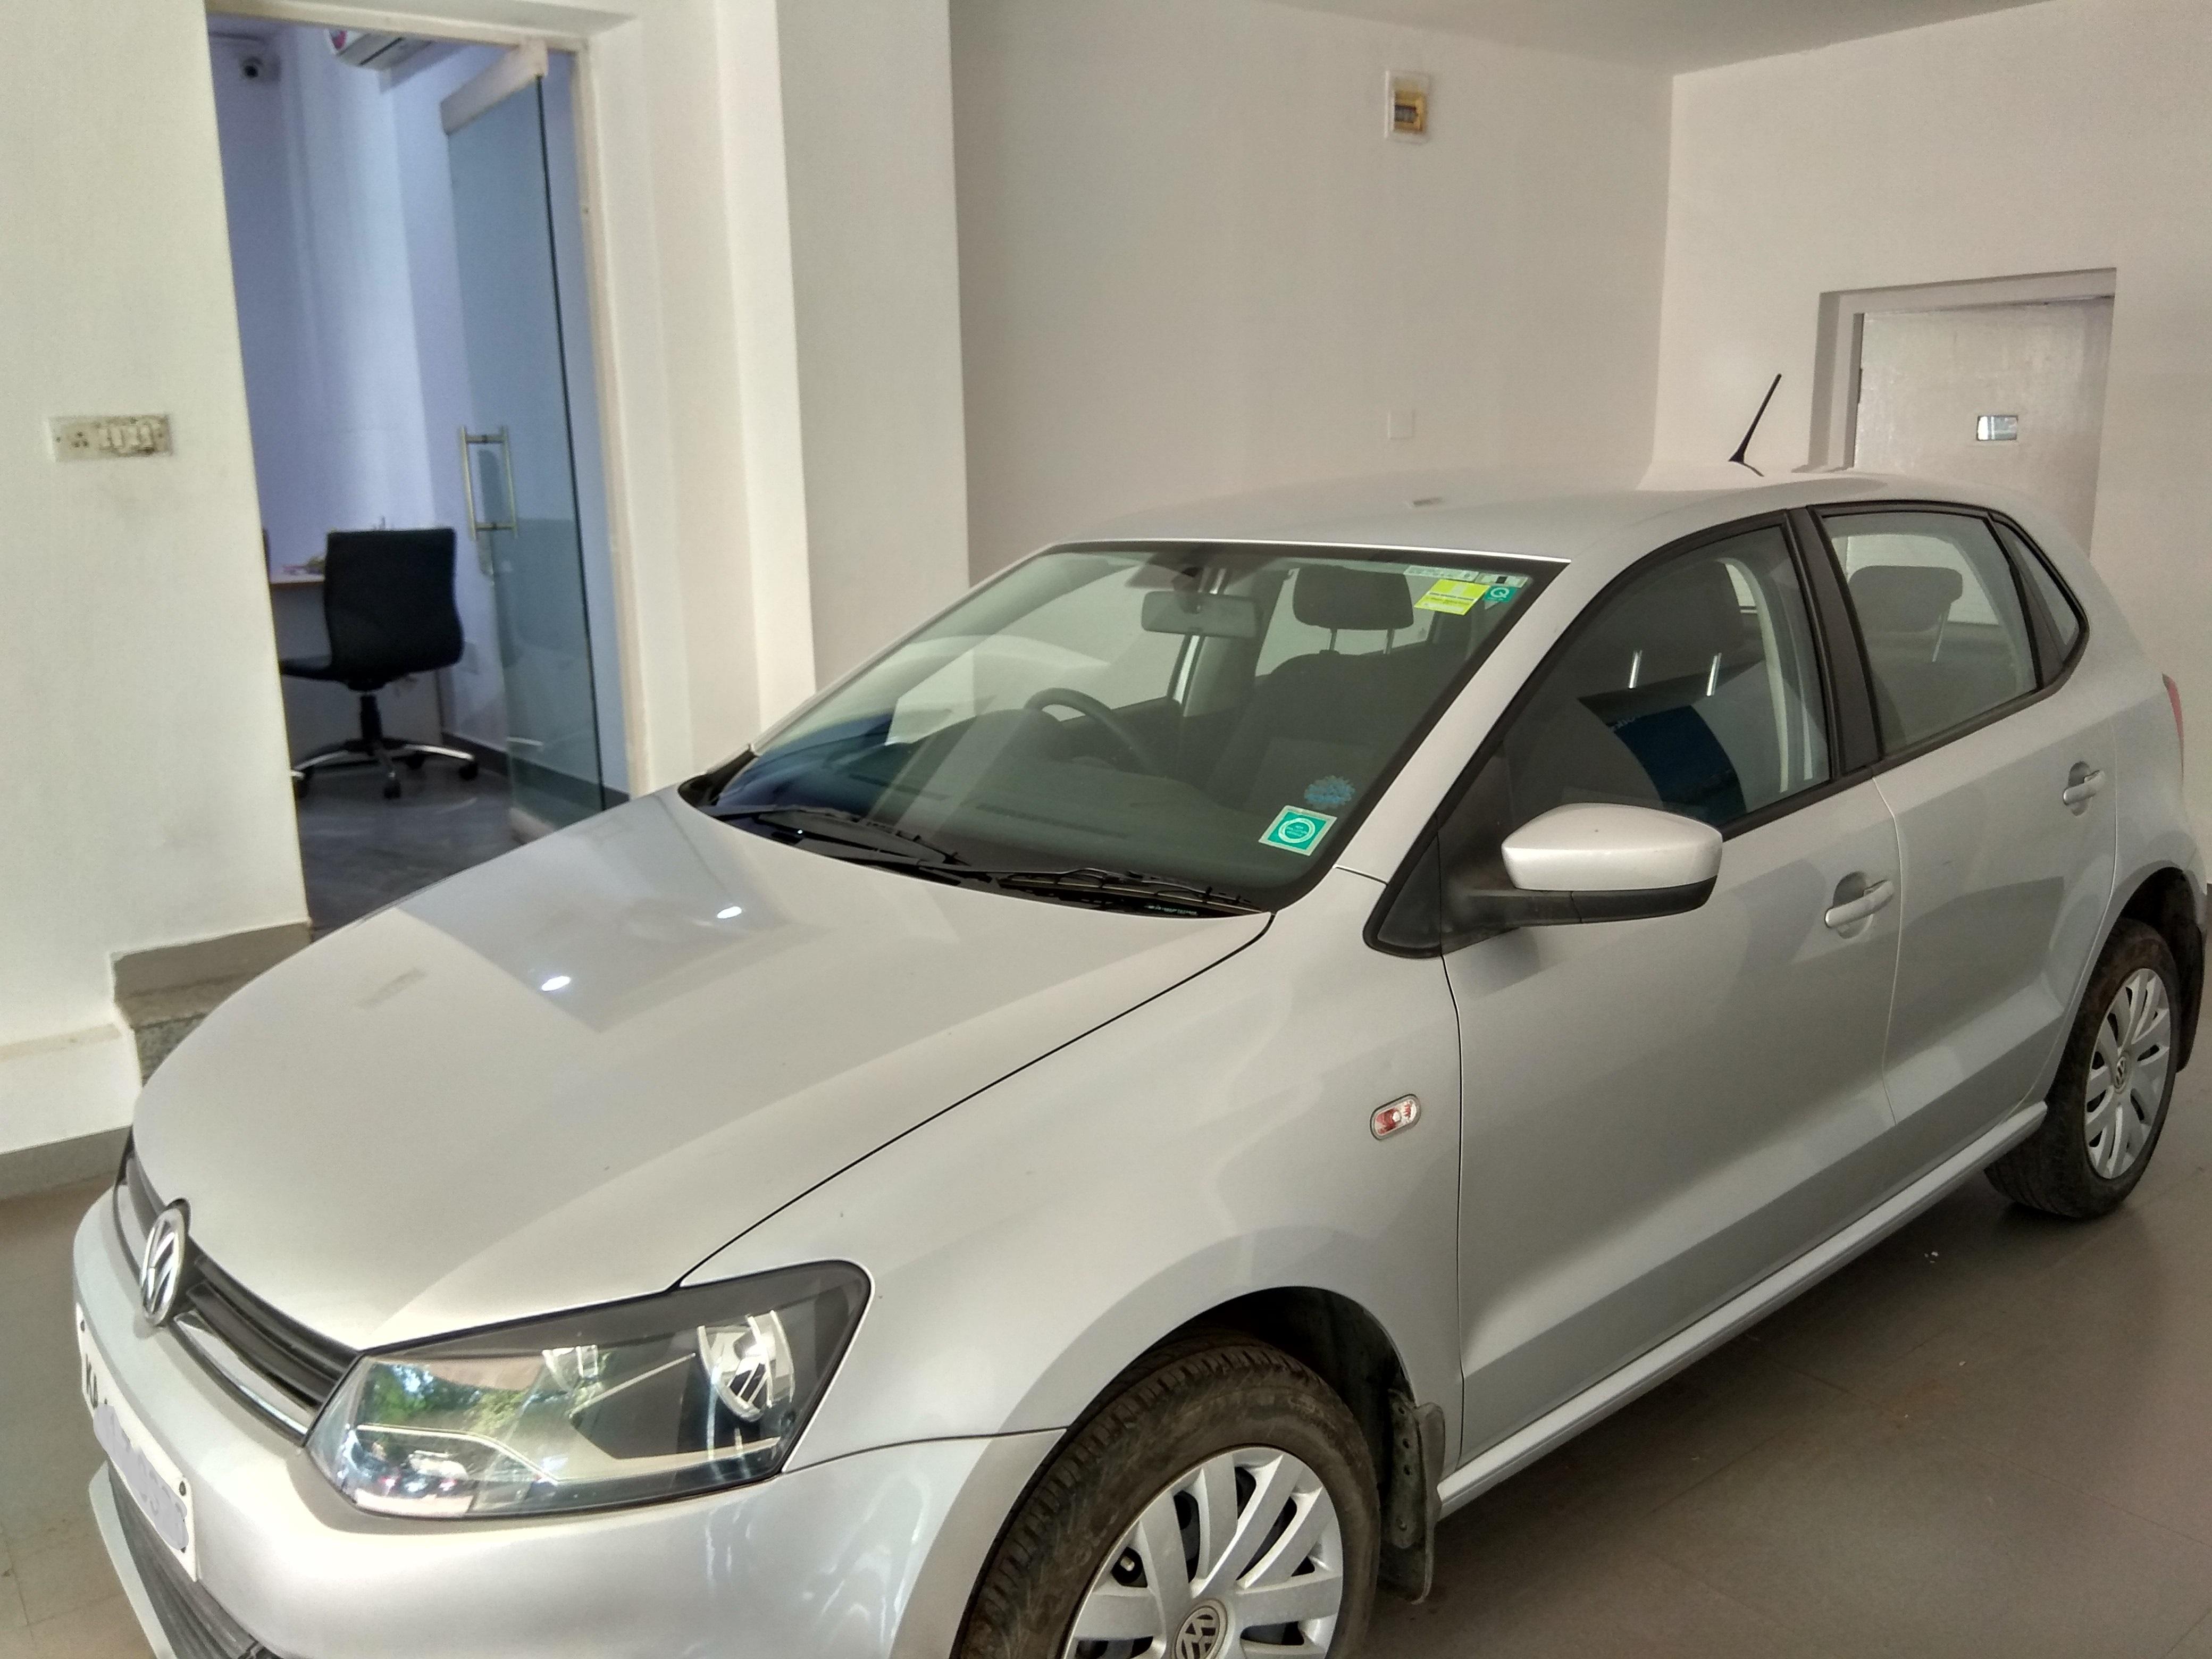 Volkswagen Polo Comfortline 1 2l Petrol Mahindra First